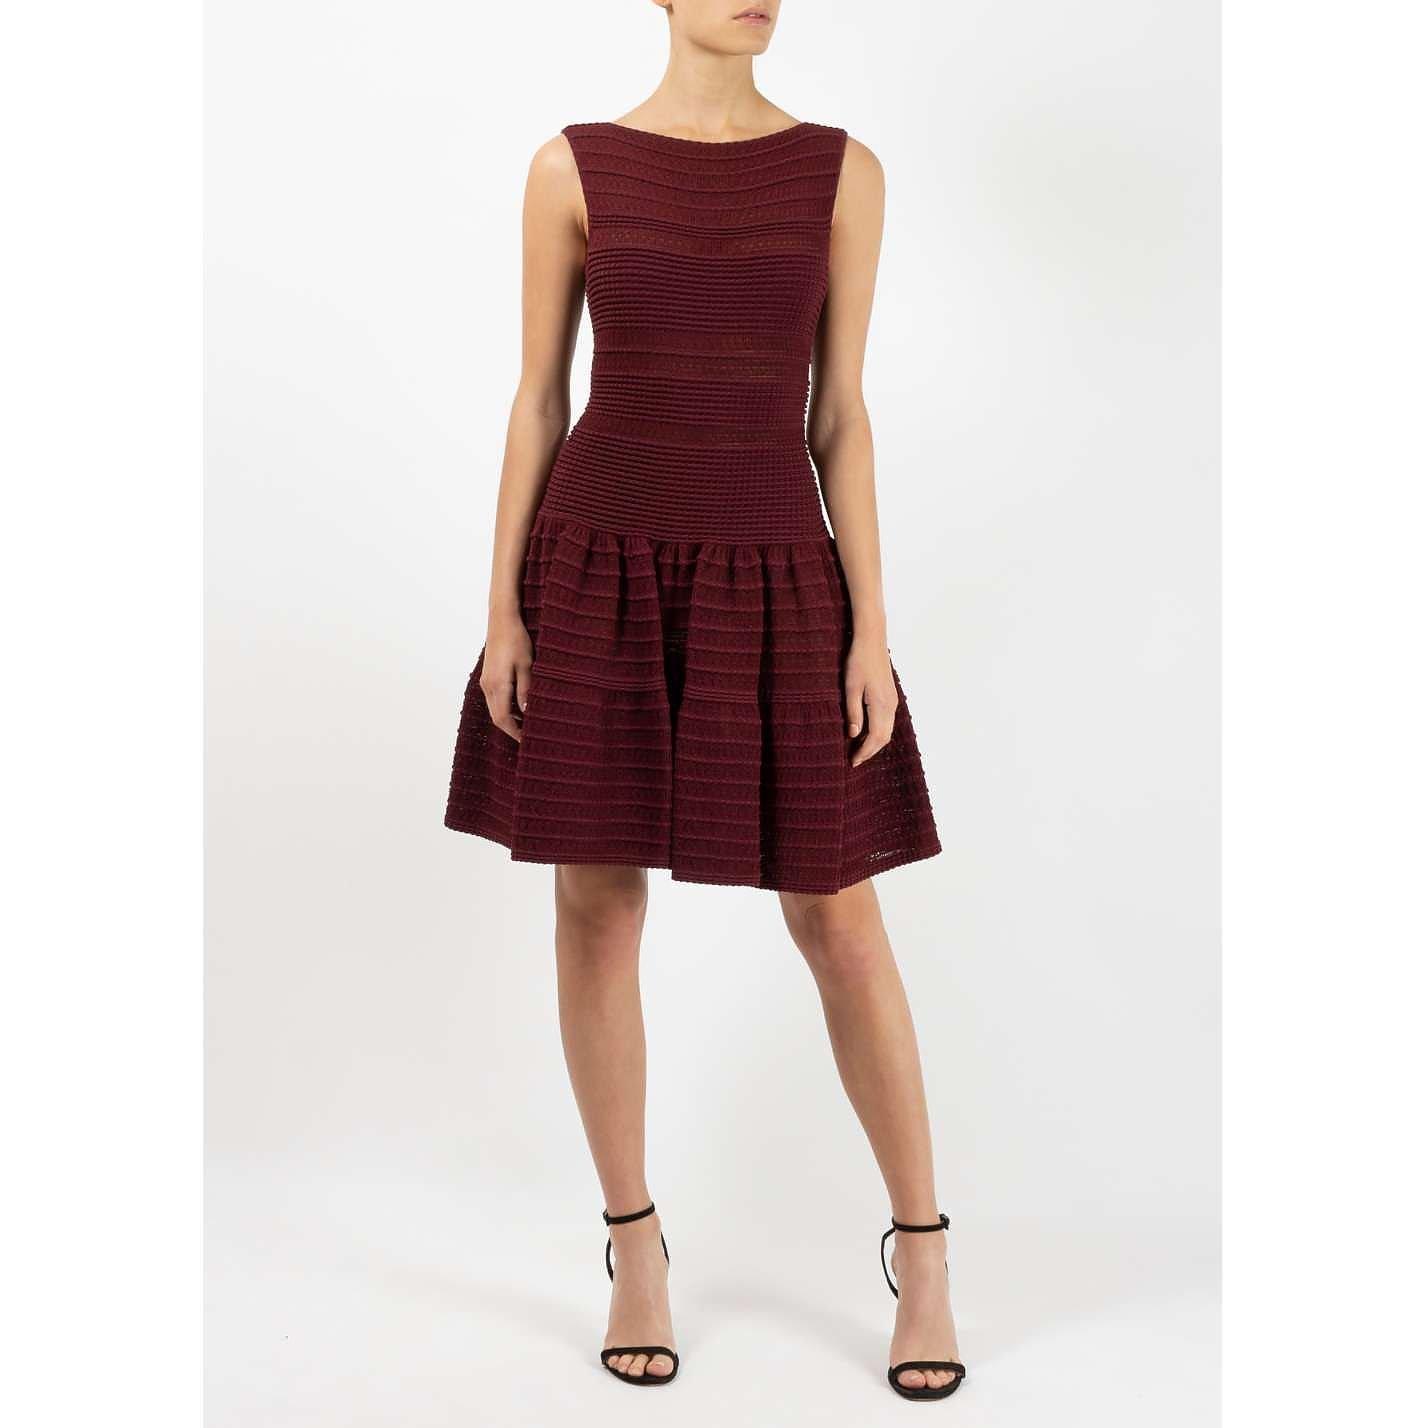 Alaïa Knitted Dress